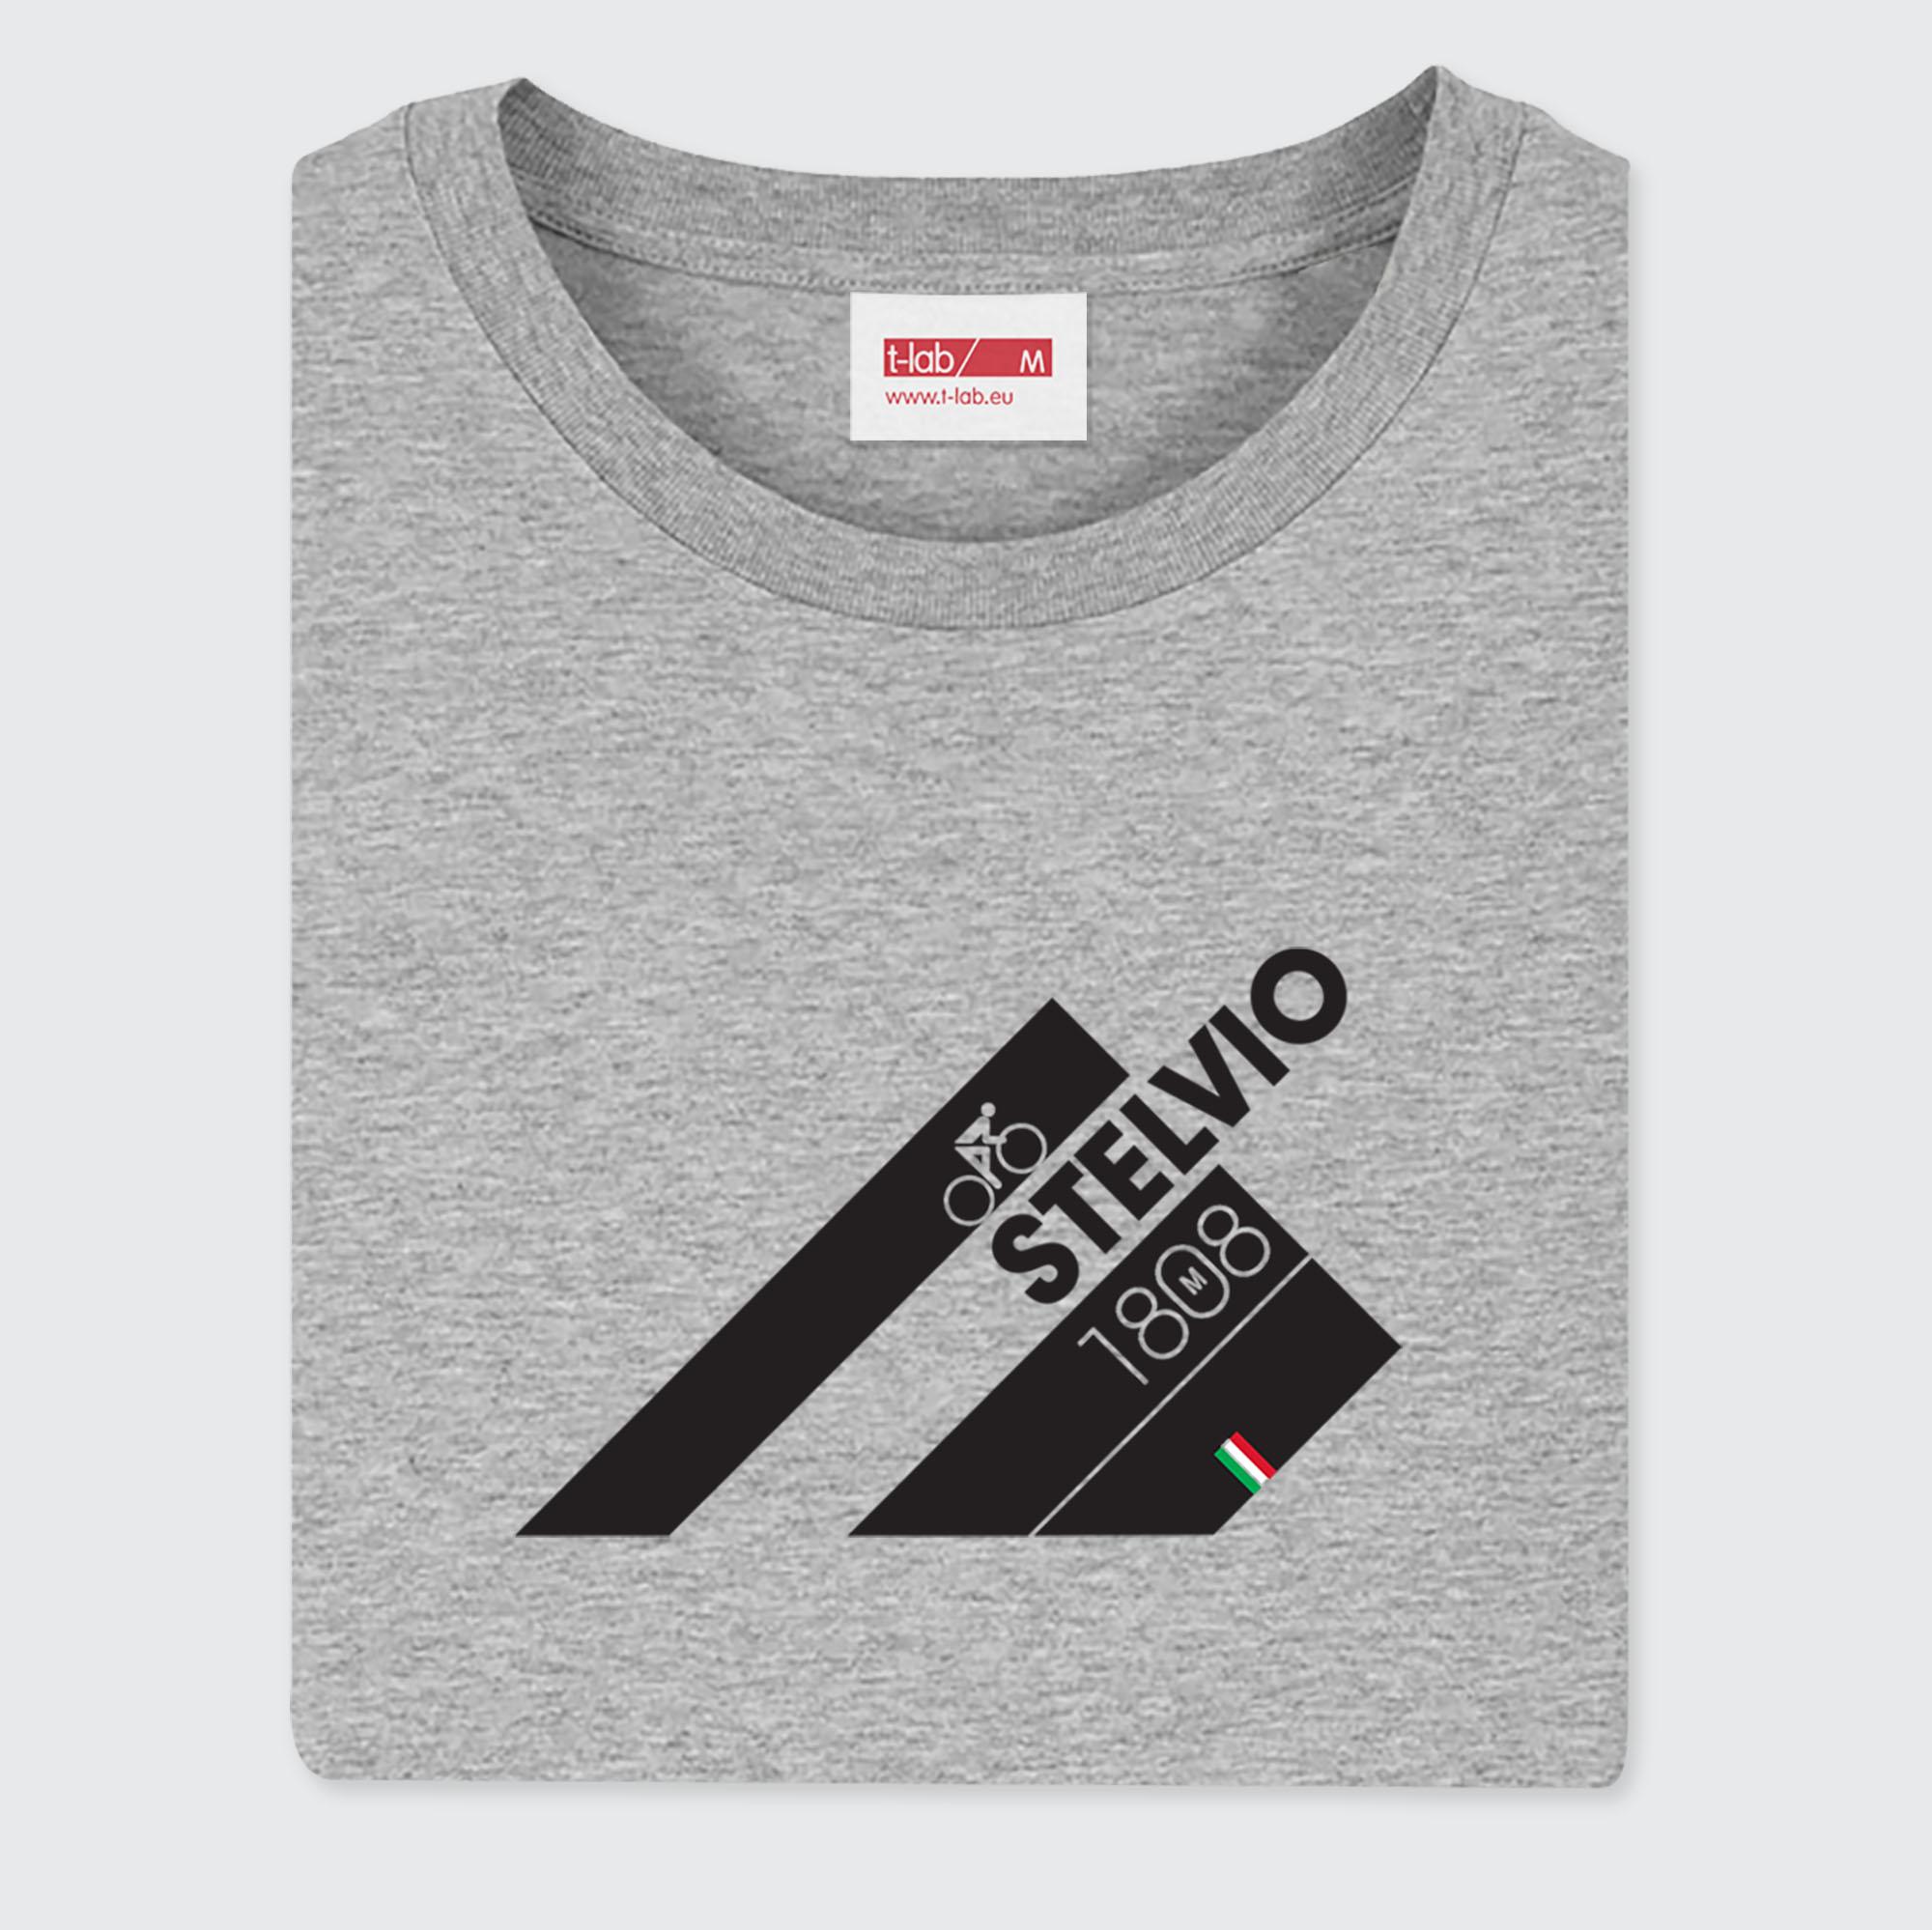 T-lab-Stelvio-mens-cycling-t-shirt-longsleeve